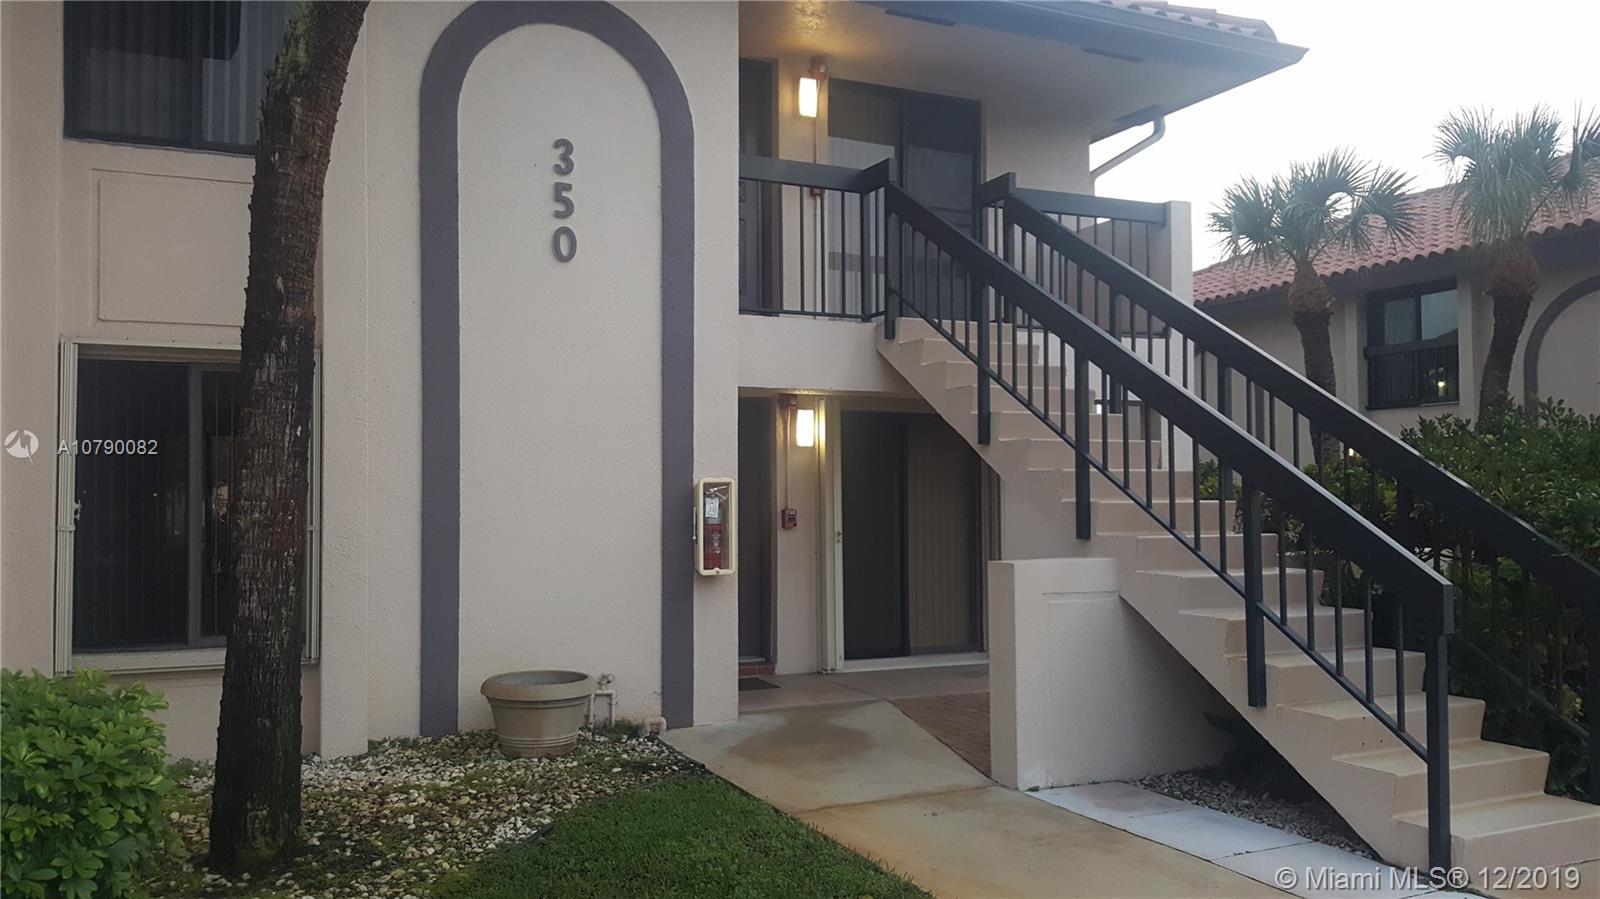 350 Club Cir 110, Boca Raton, FL 33487